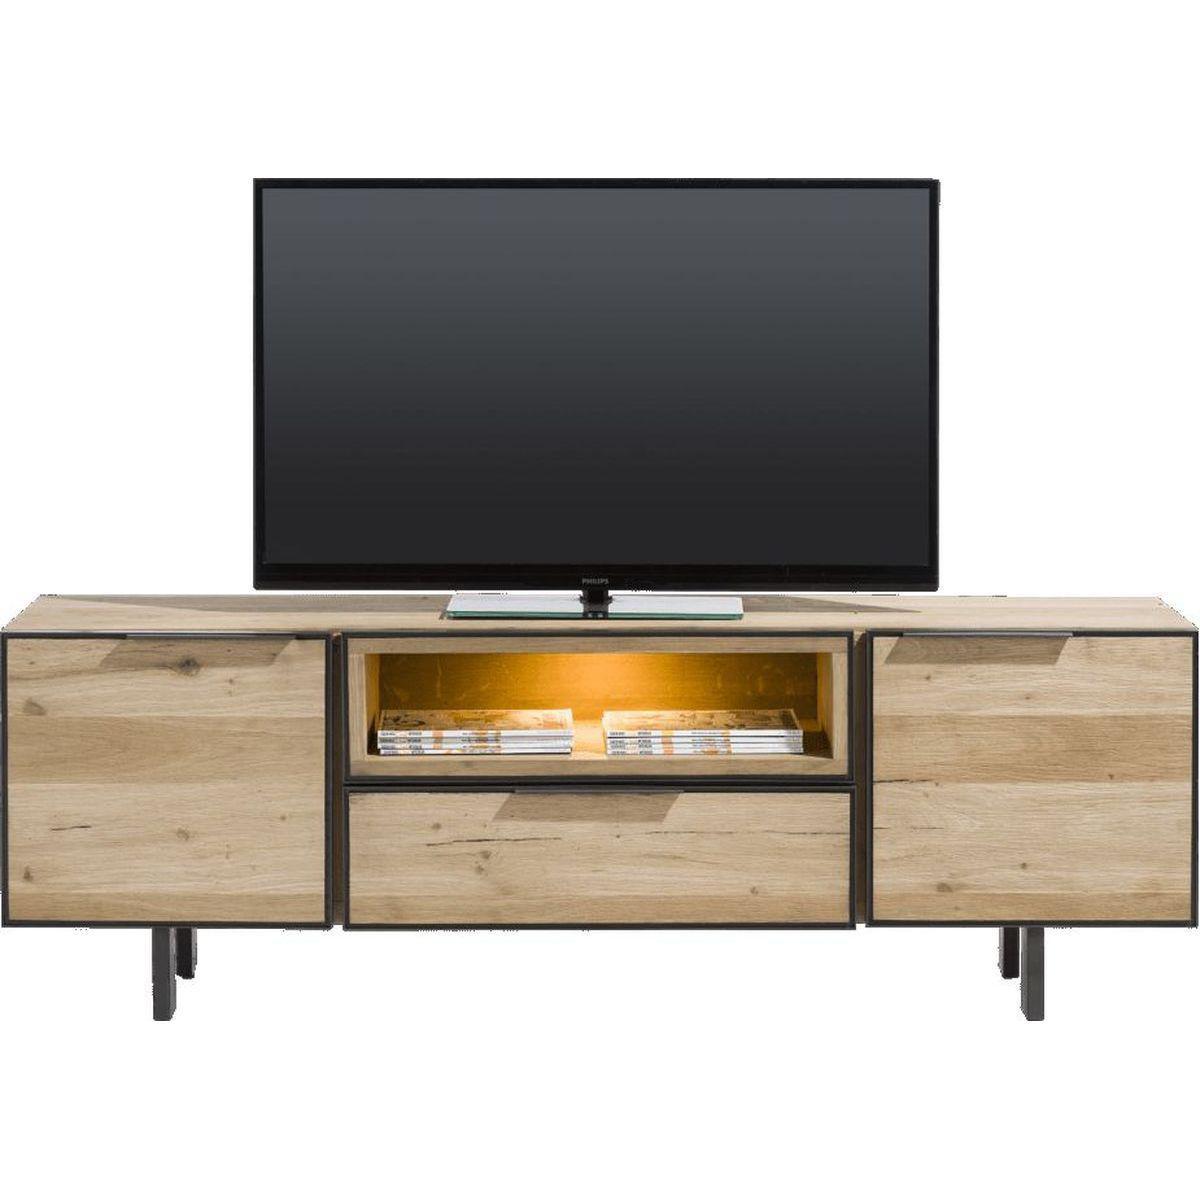 Meuble TV PEDRO H&H 2 portes-1 niche-1 tiroir LED 180 cm